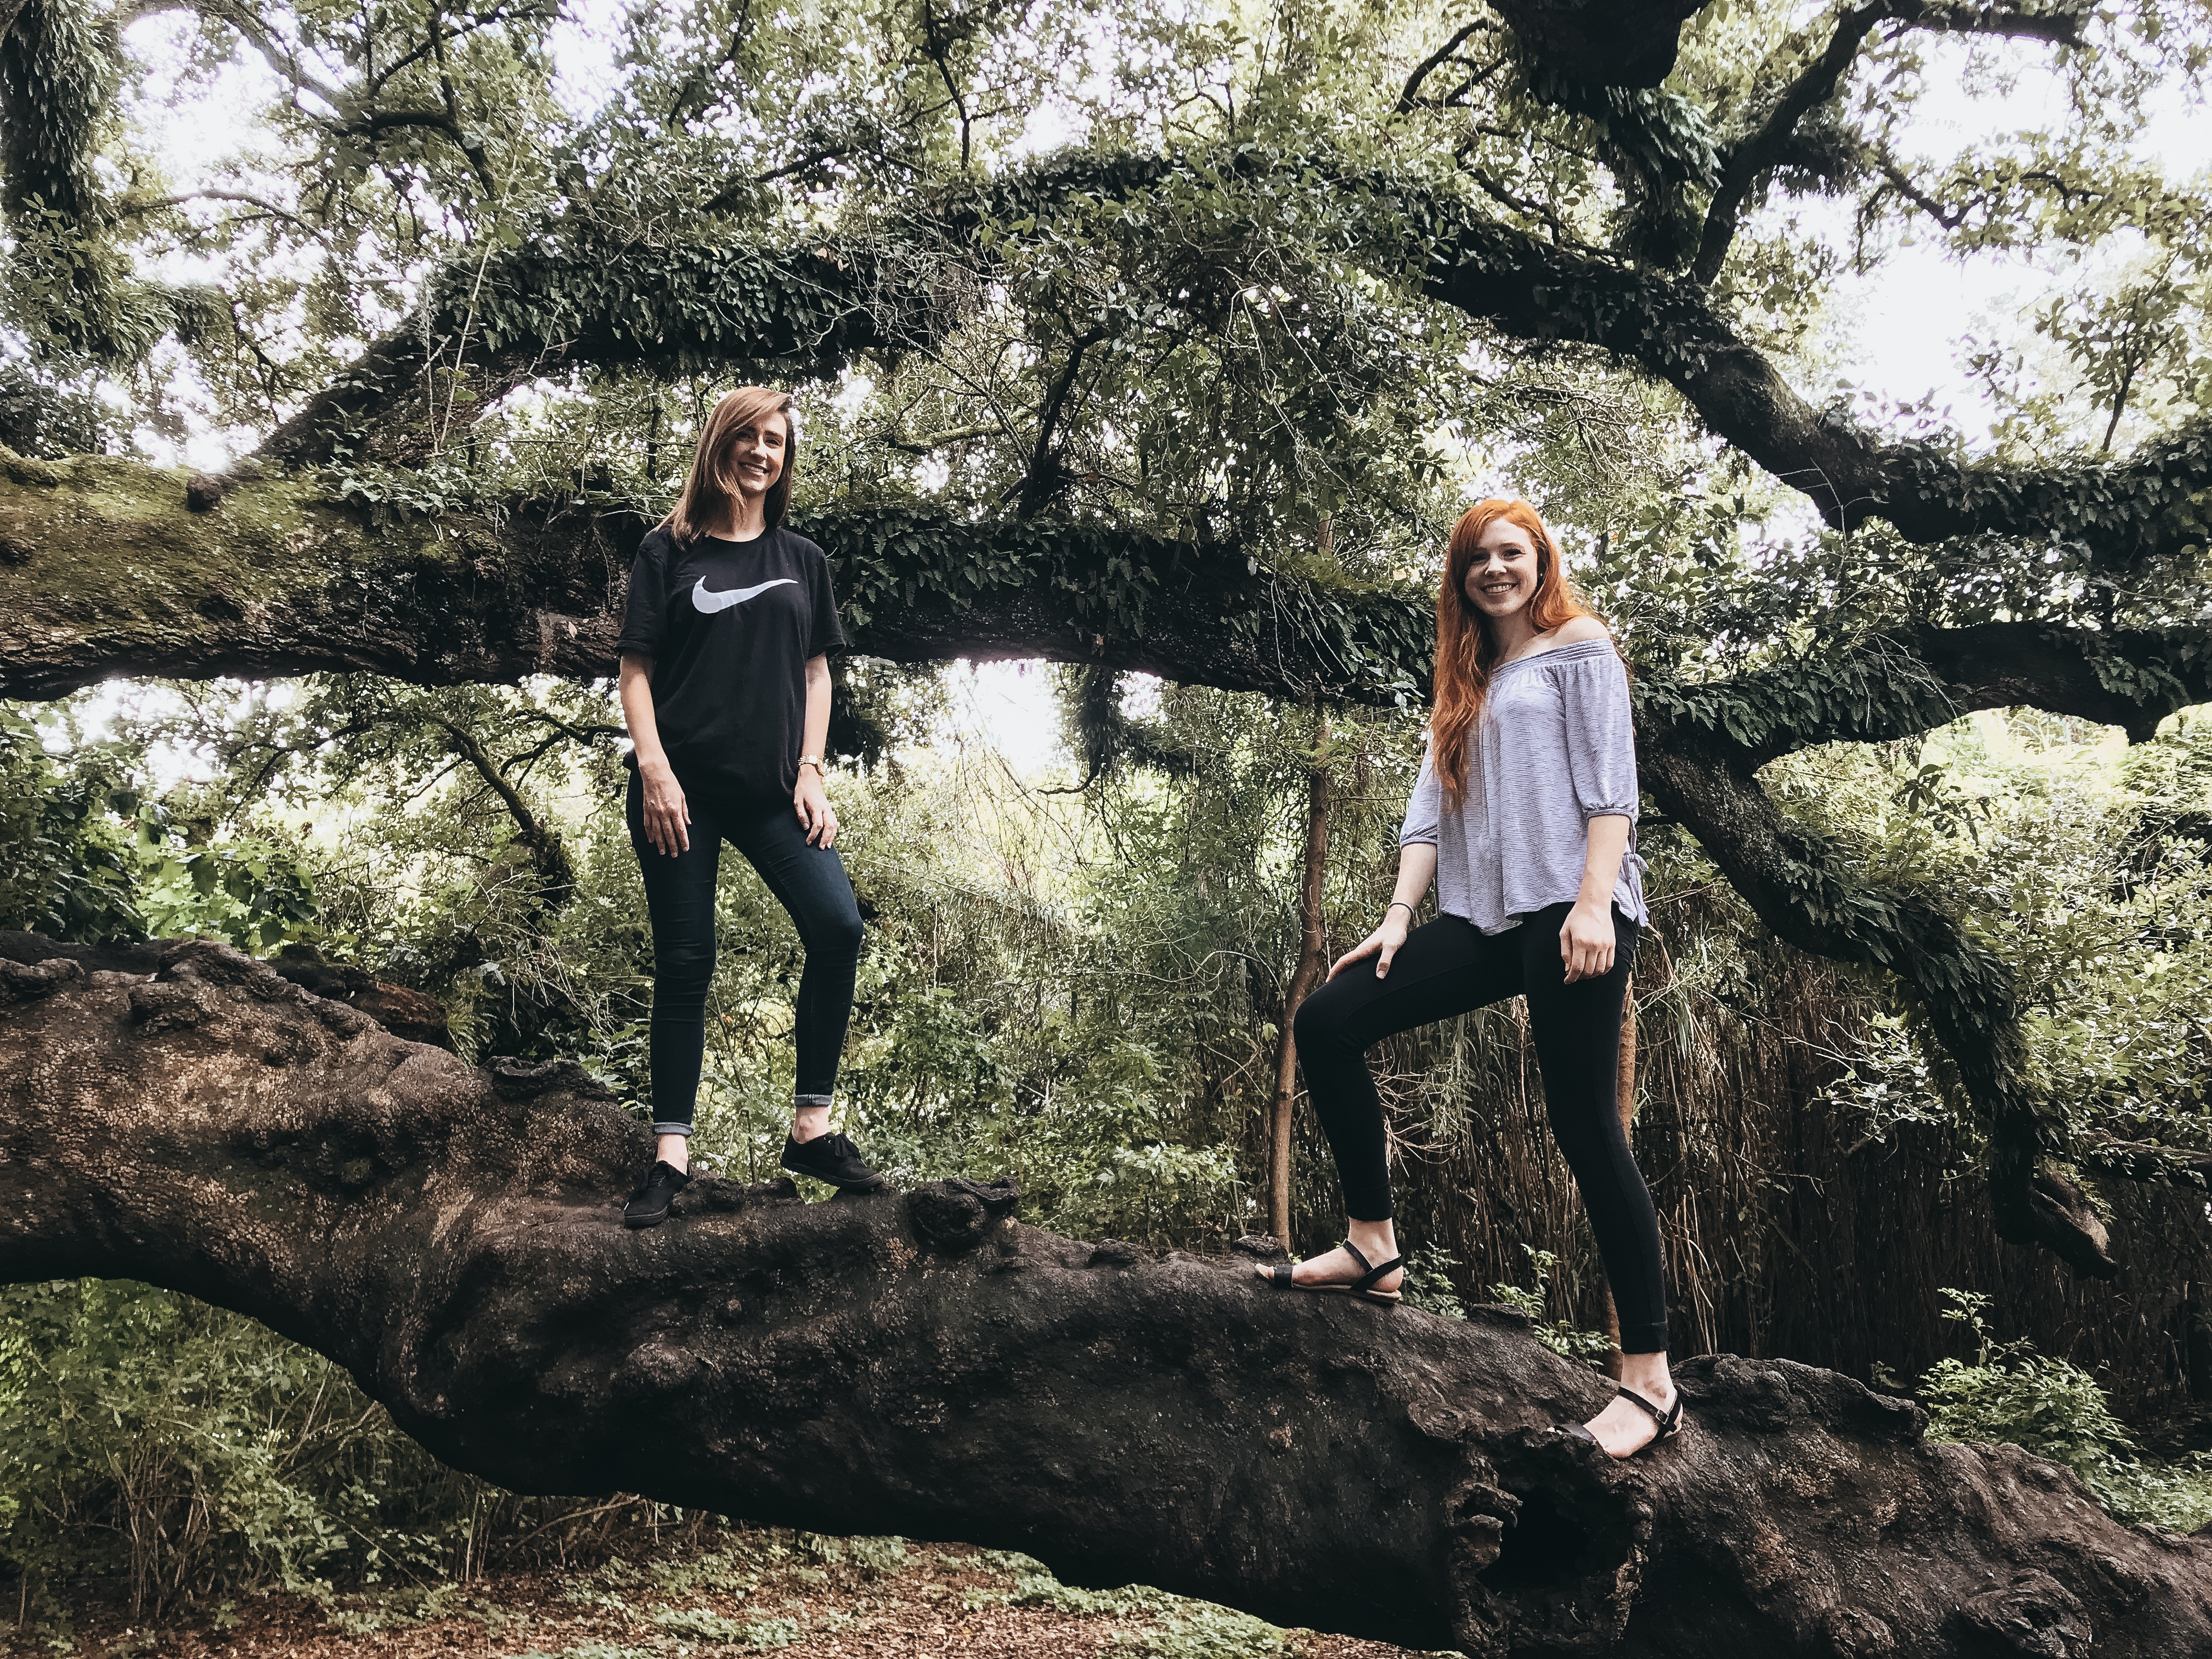 standing on tree